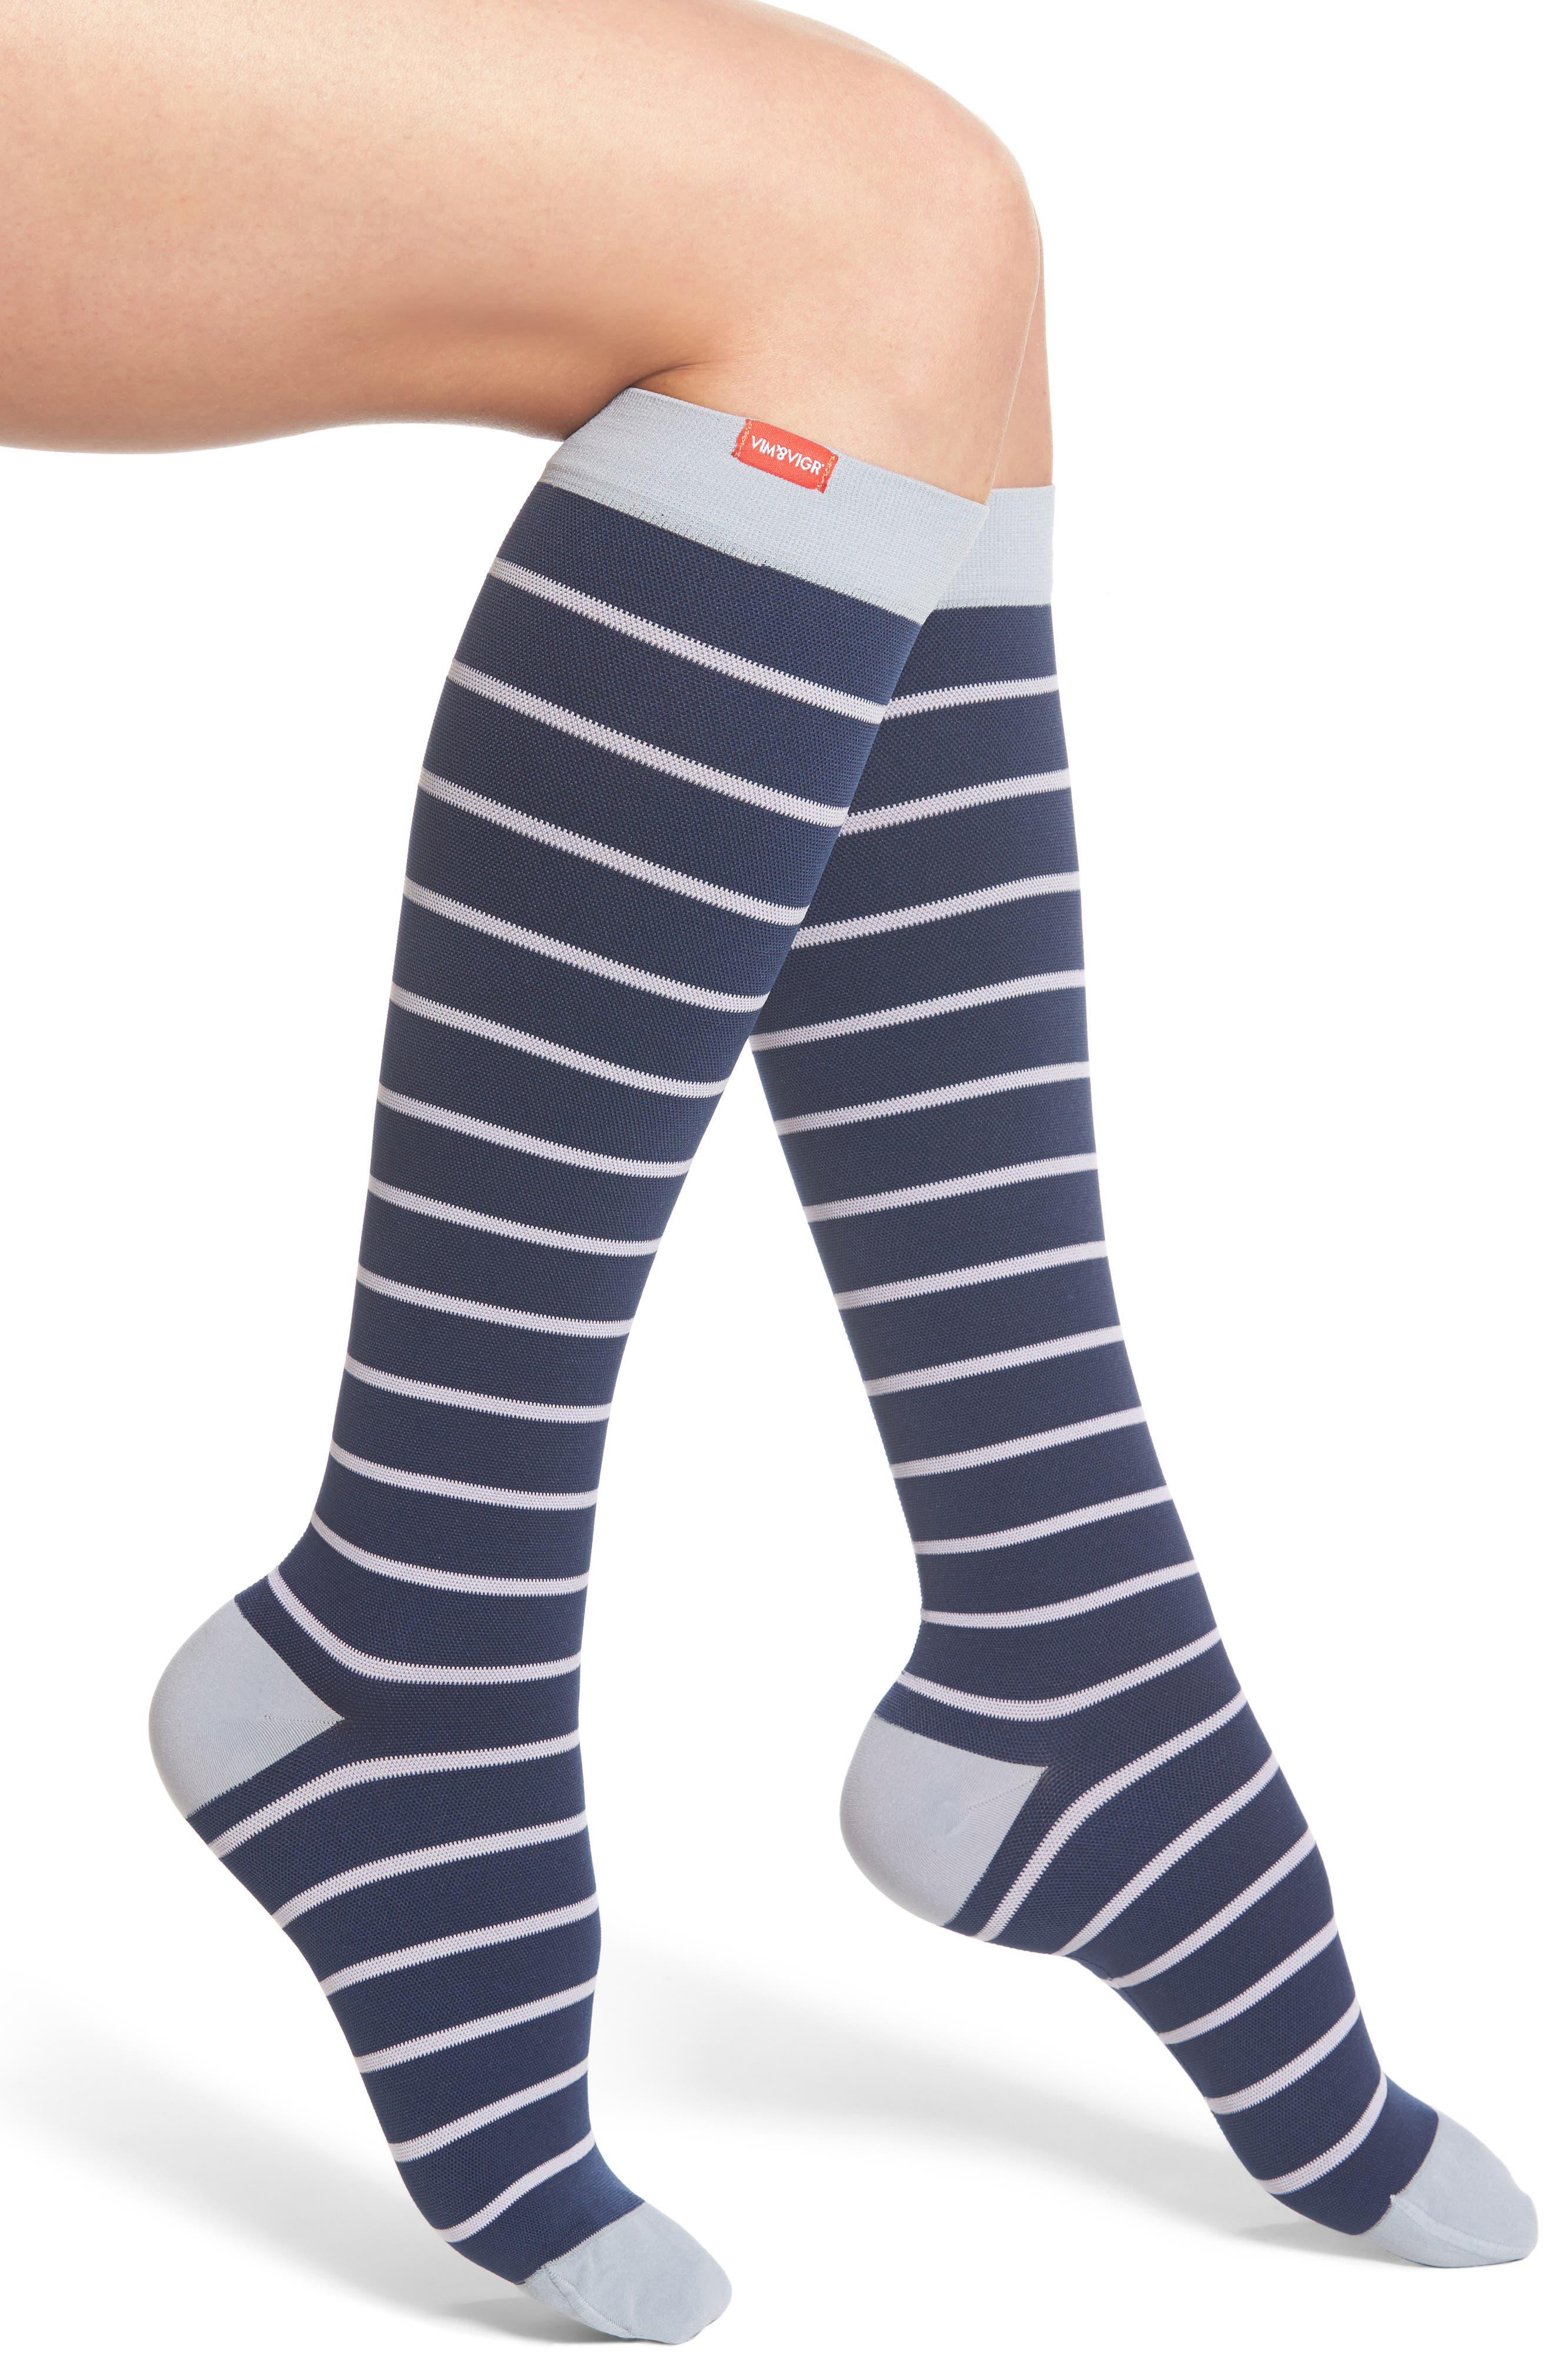 Nautical Stripe Graduated Compression Trouser Socks,                             Main thumbnail 1, color,                             Blue/ Lavender